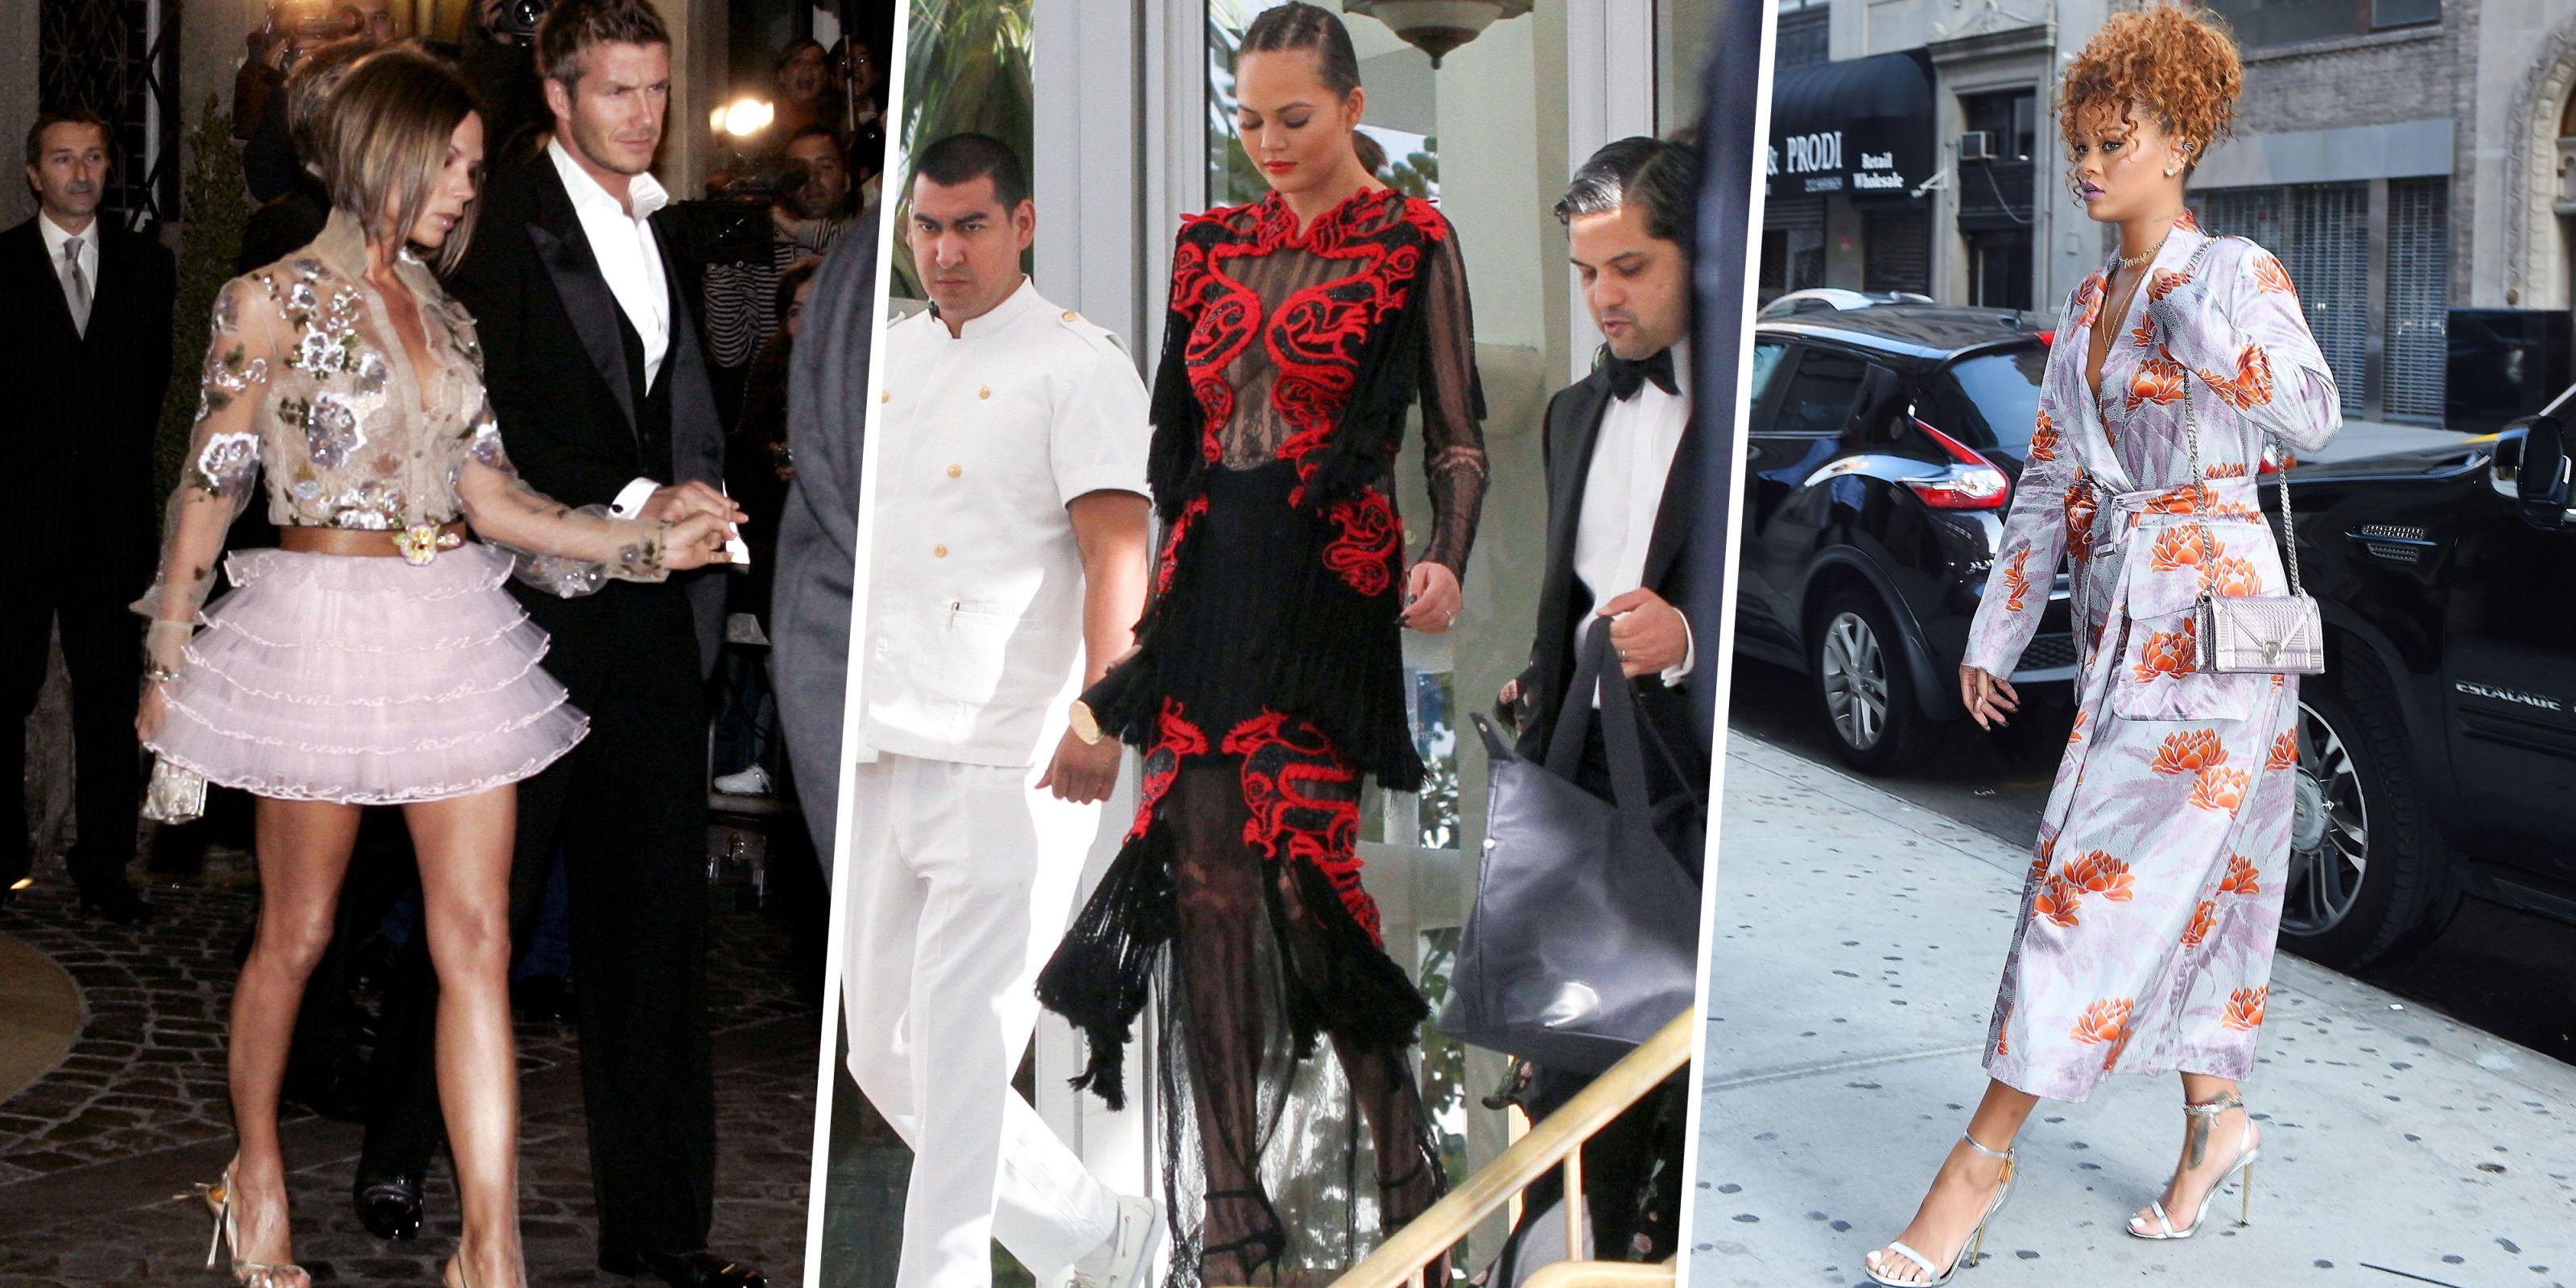 Celebrities Attending Weddings - What Celebrities Wear to ...